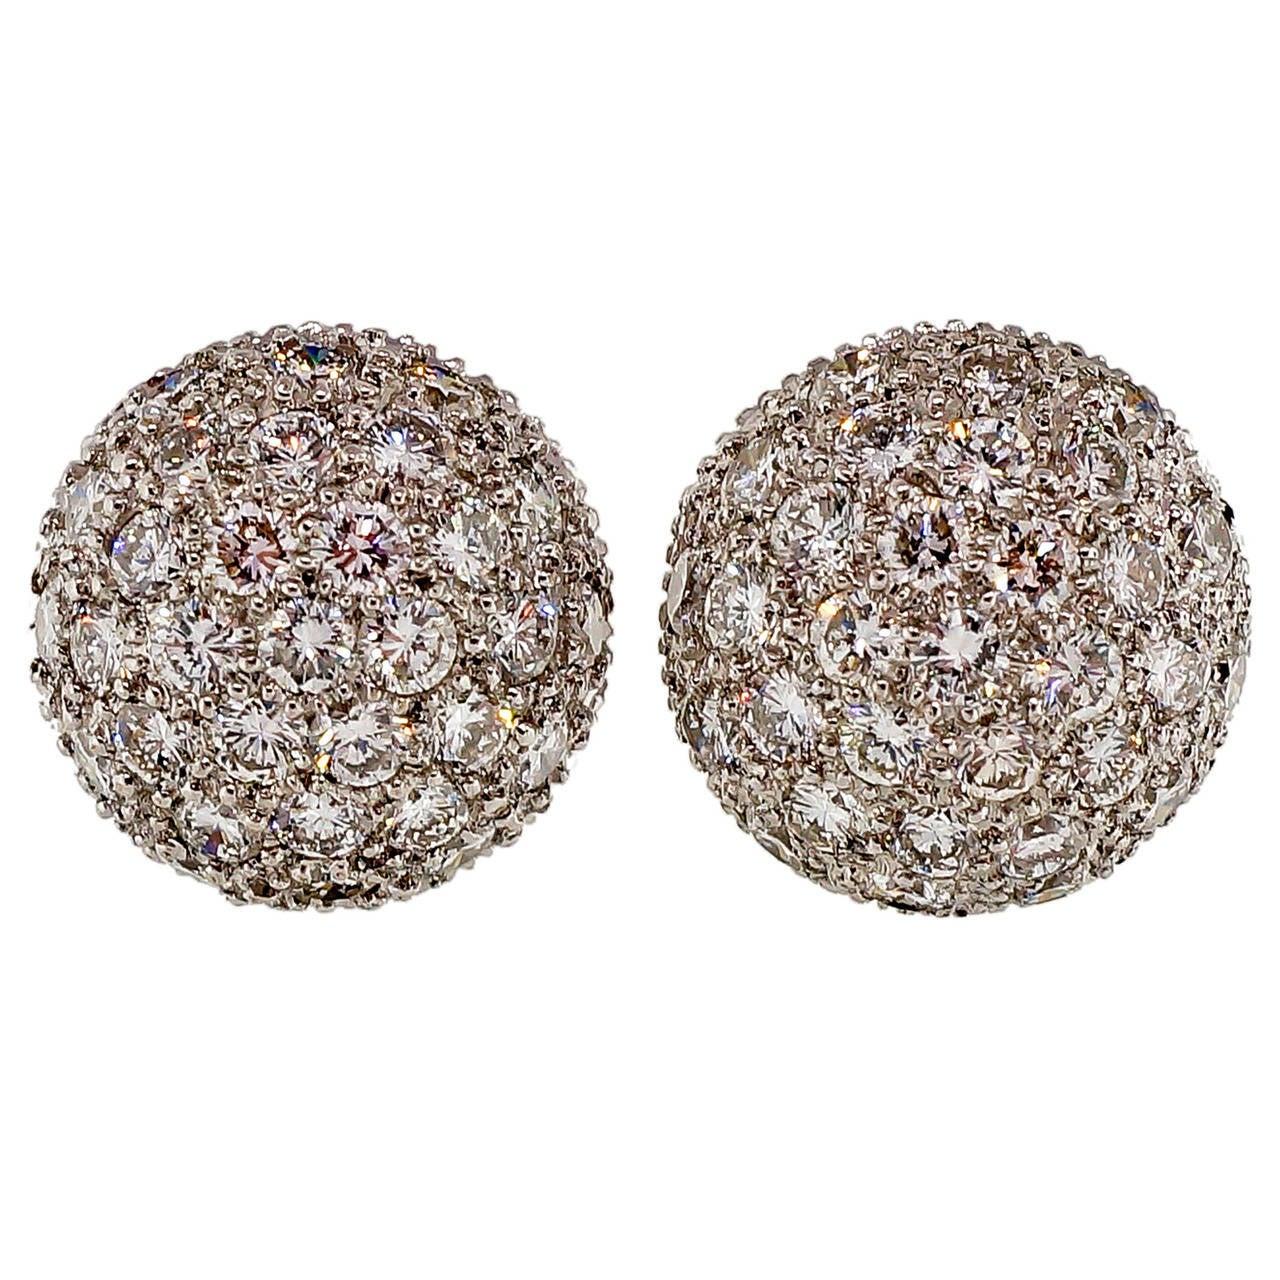 High Dome Diamond 3-D Cluster White Gold Earrings